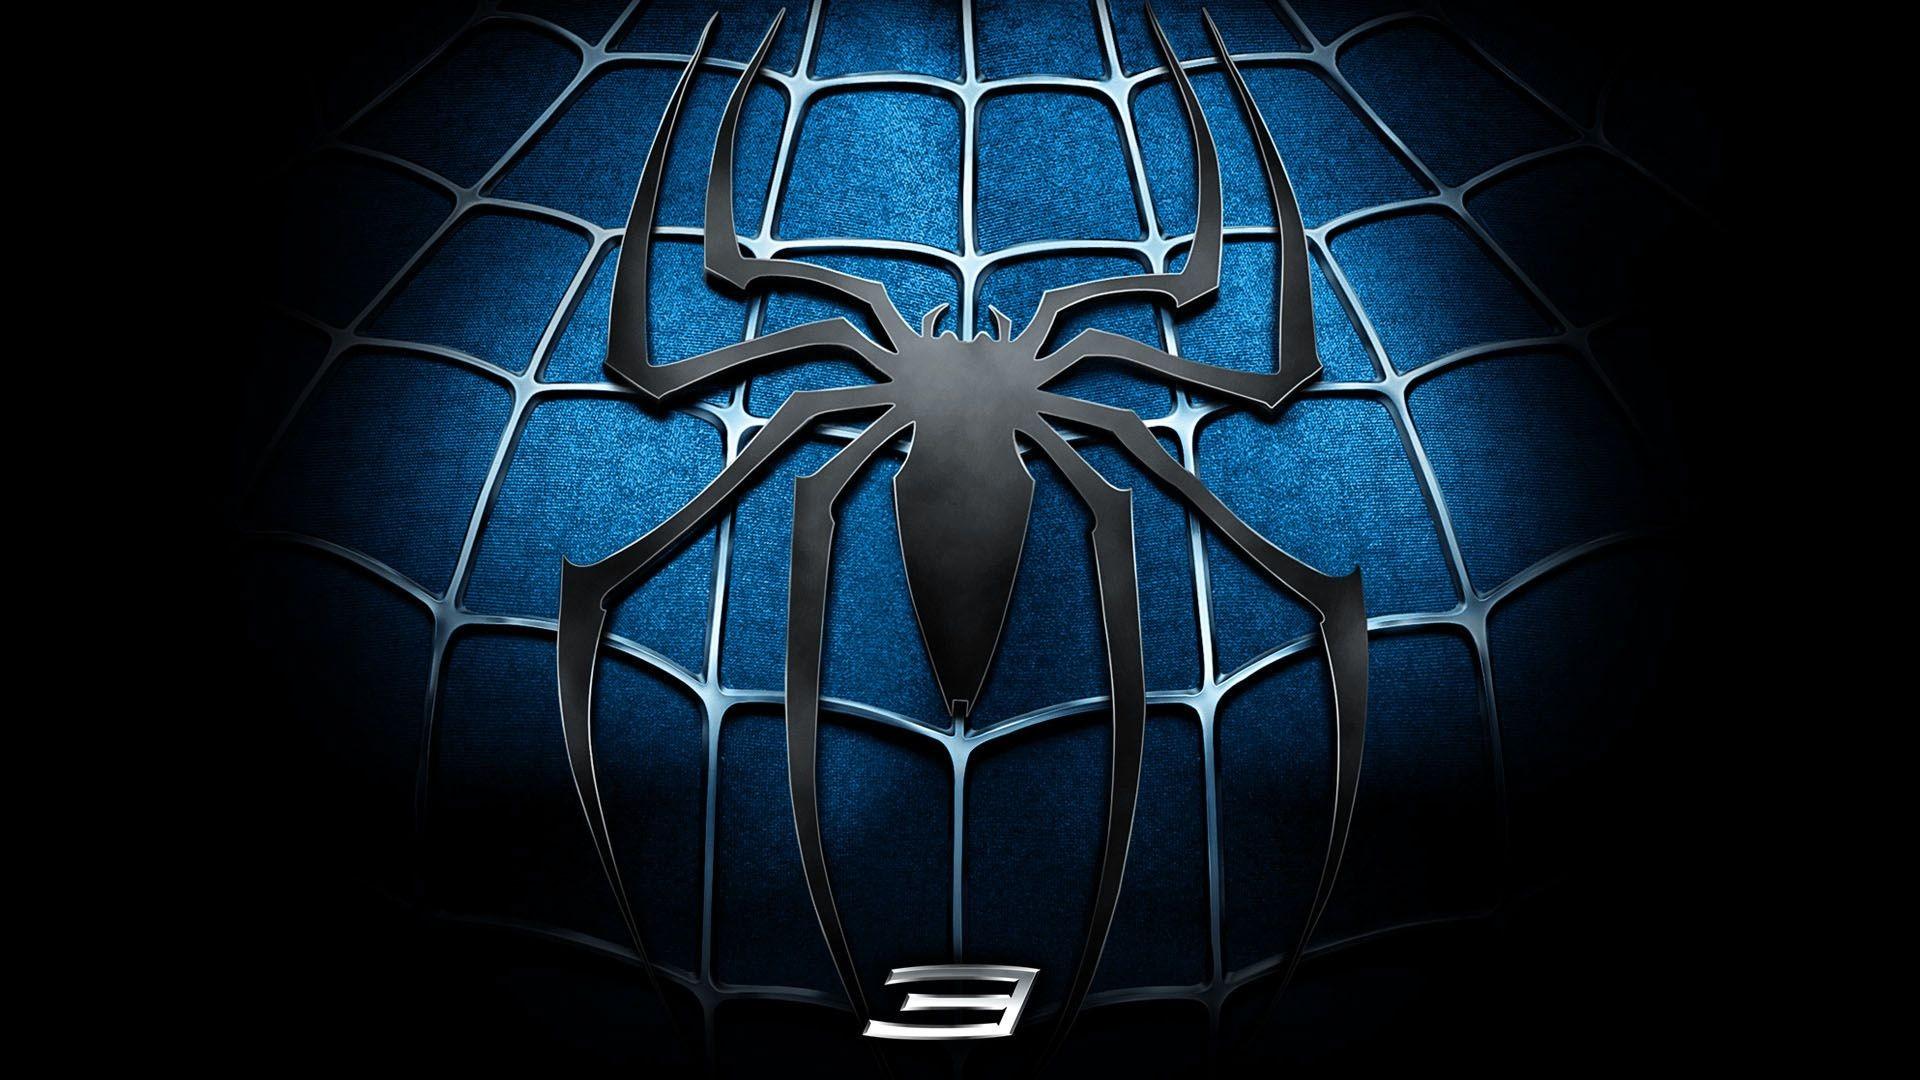 Black Spiderman Iphone Wallpapers HD.